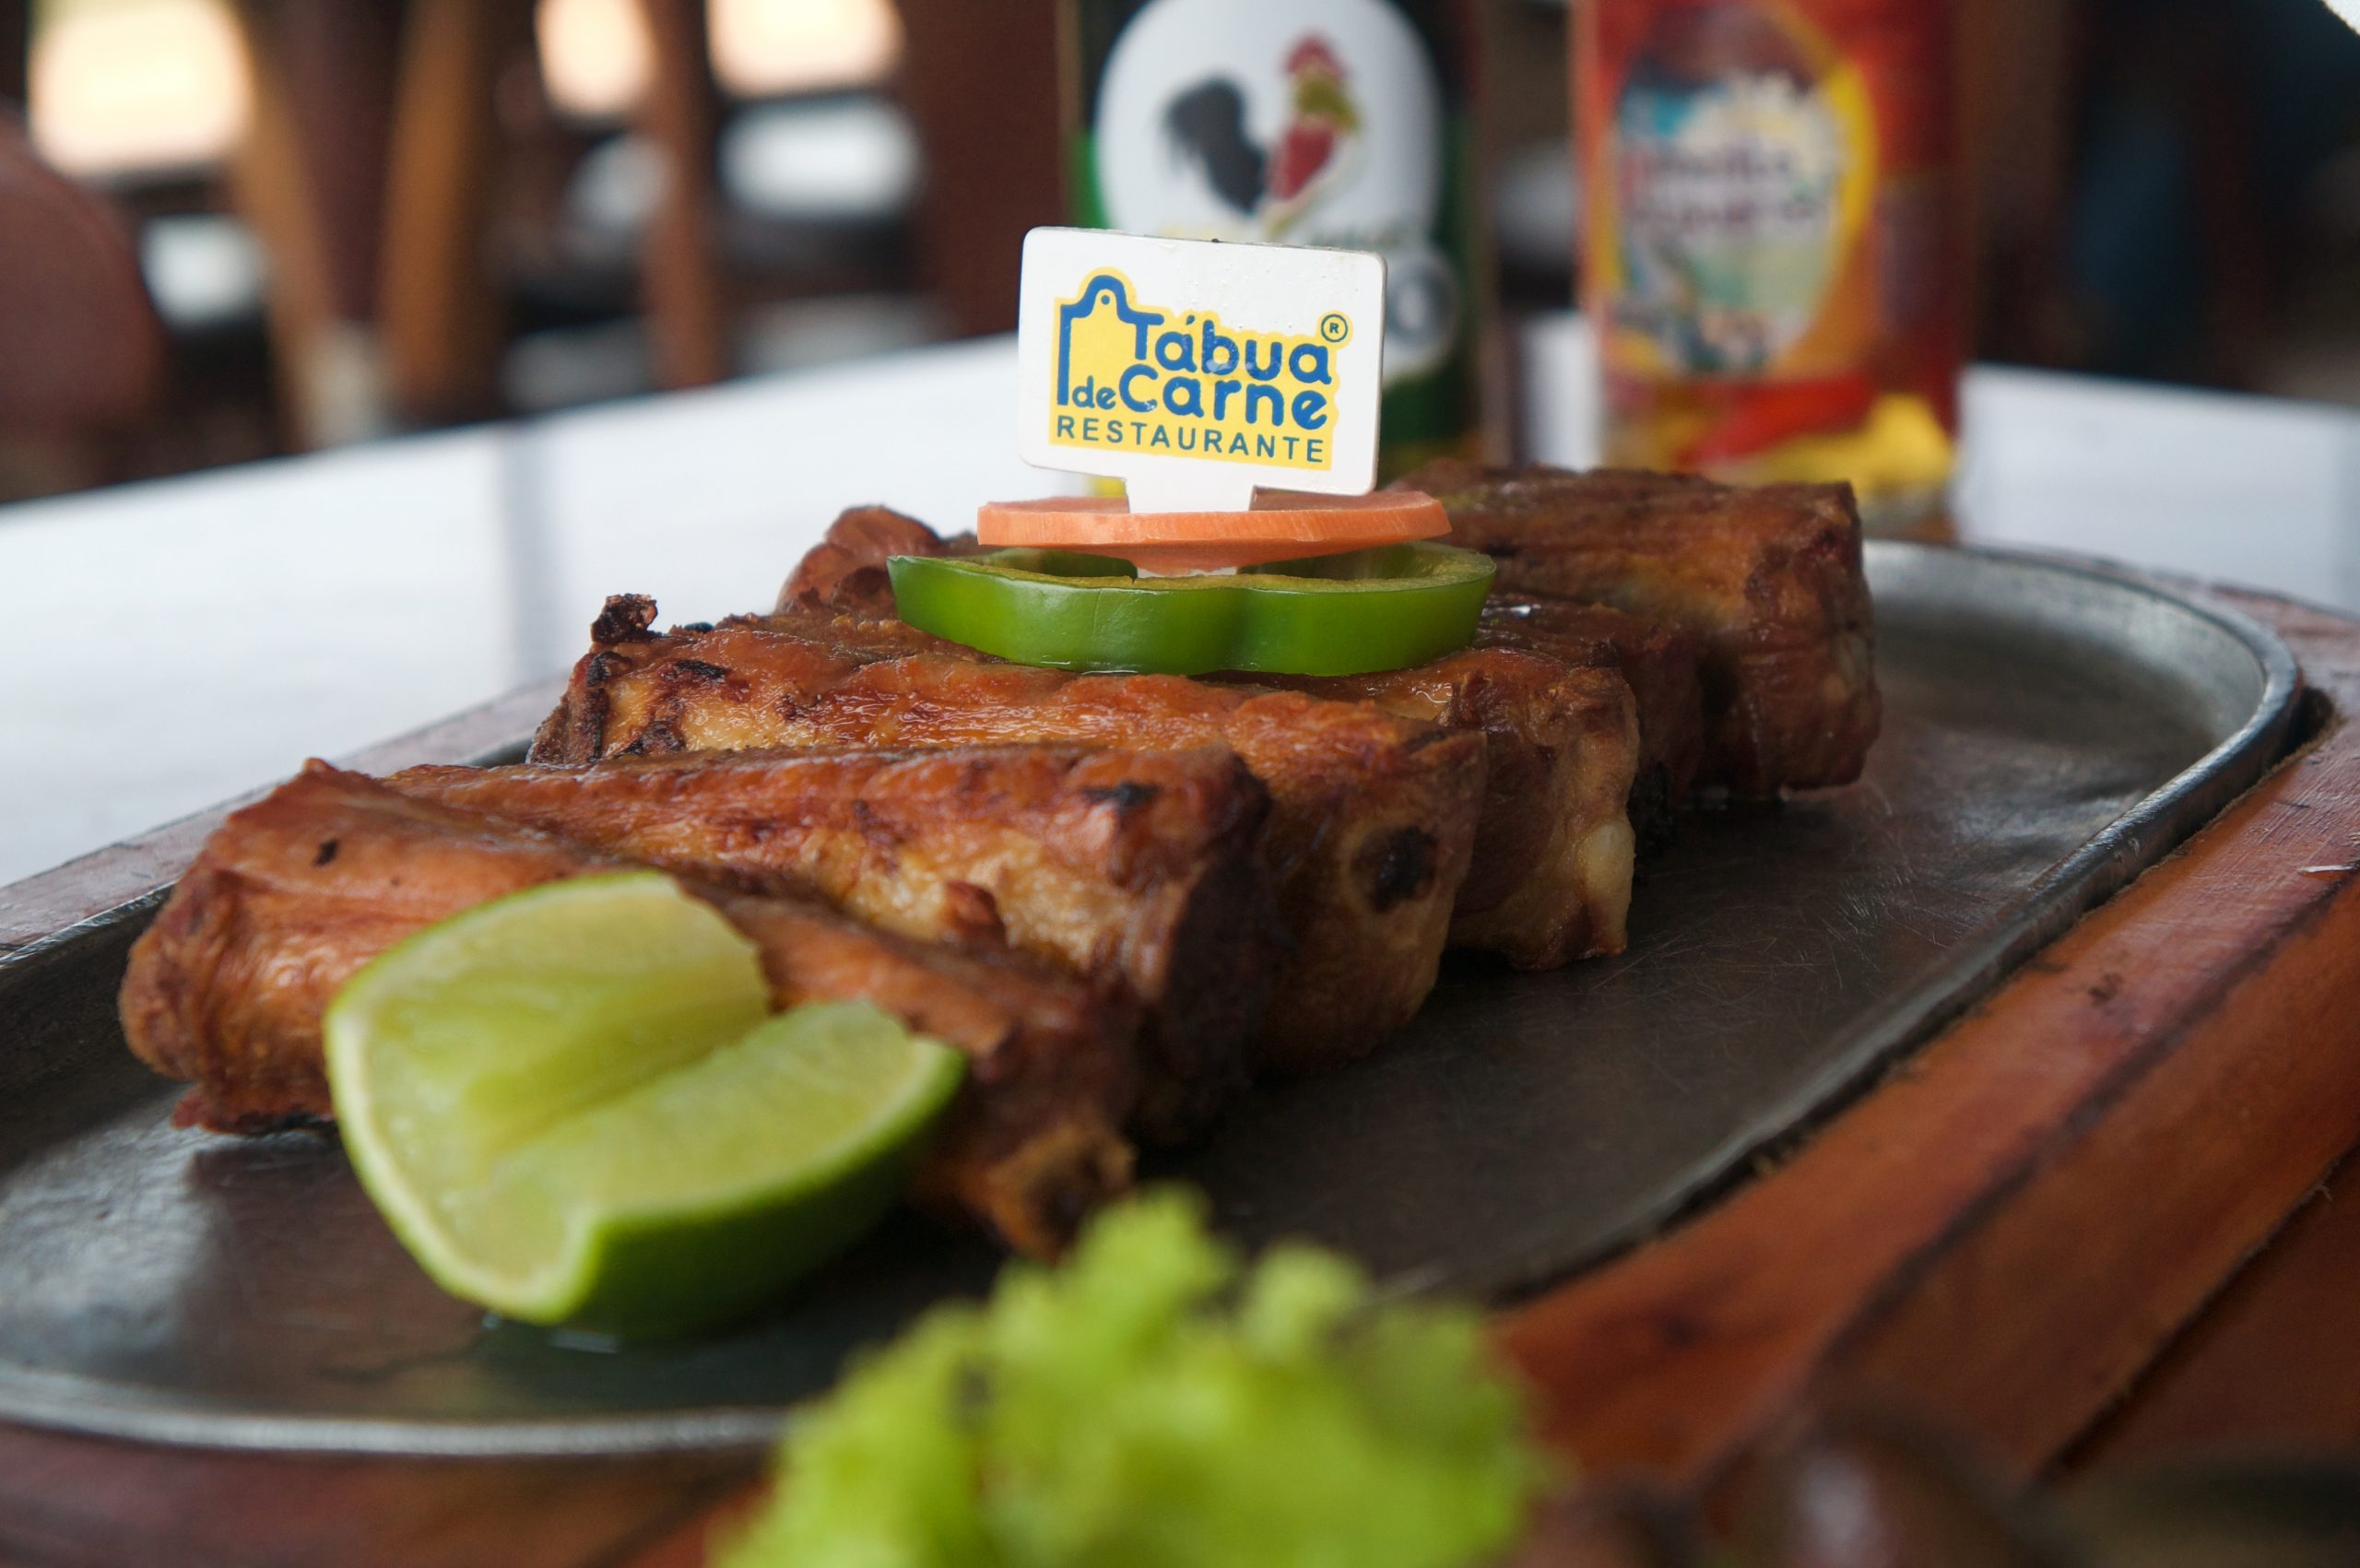 Tábua de Carne se mantém fiel a mesa regional do Nordeste